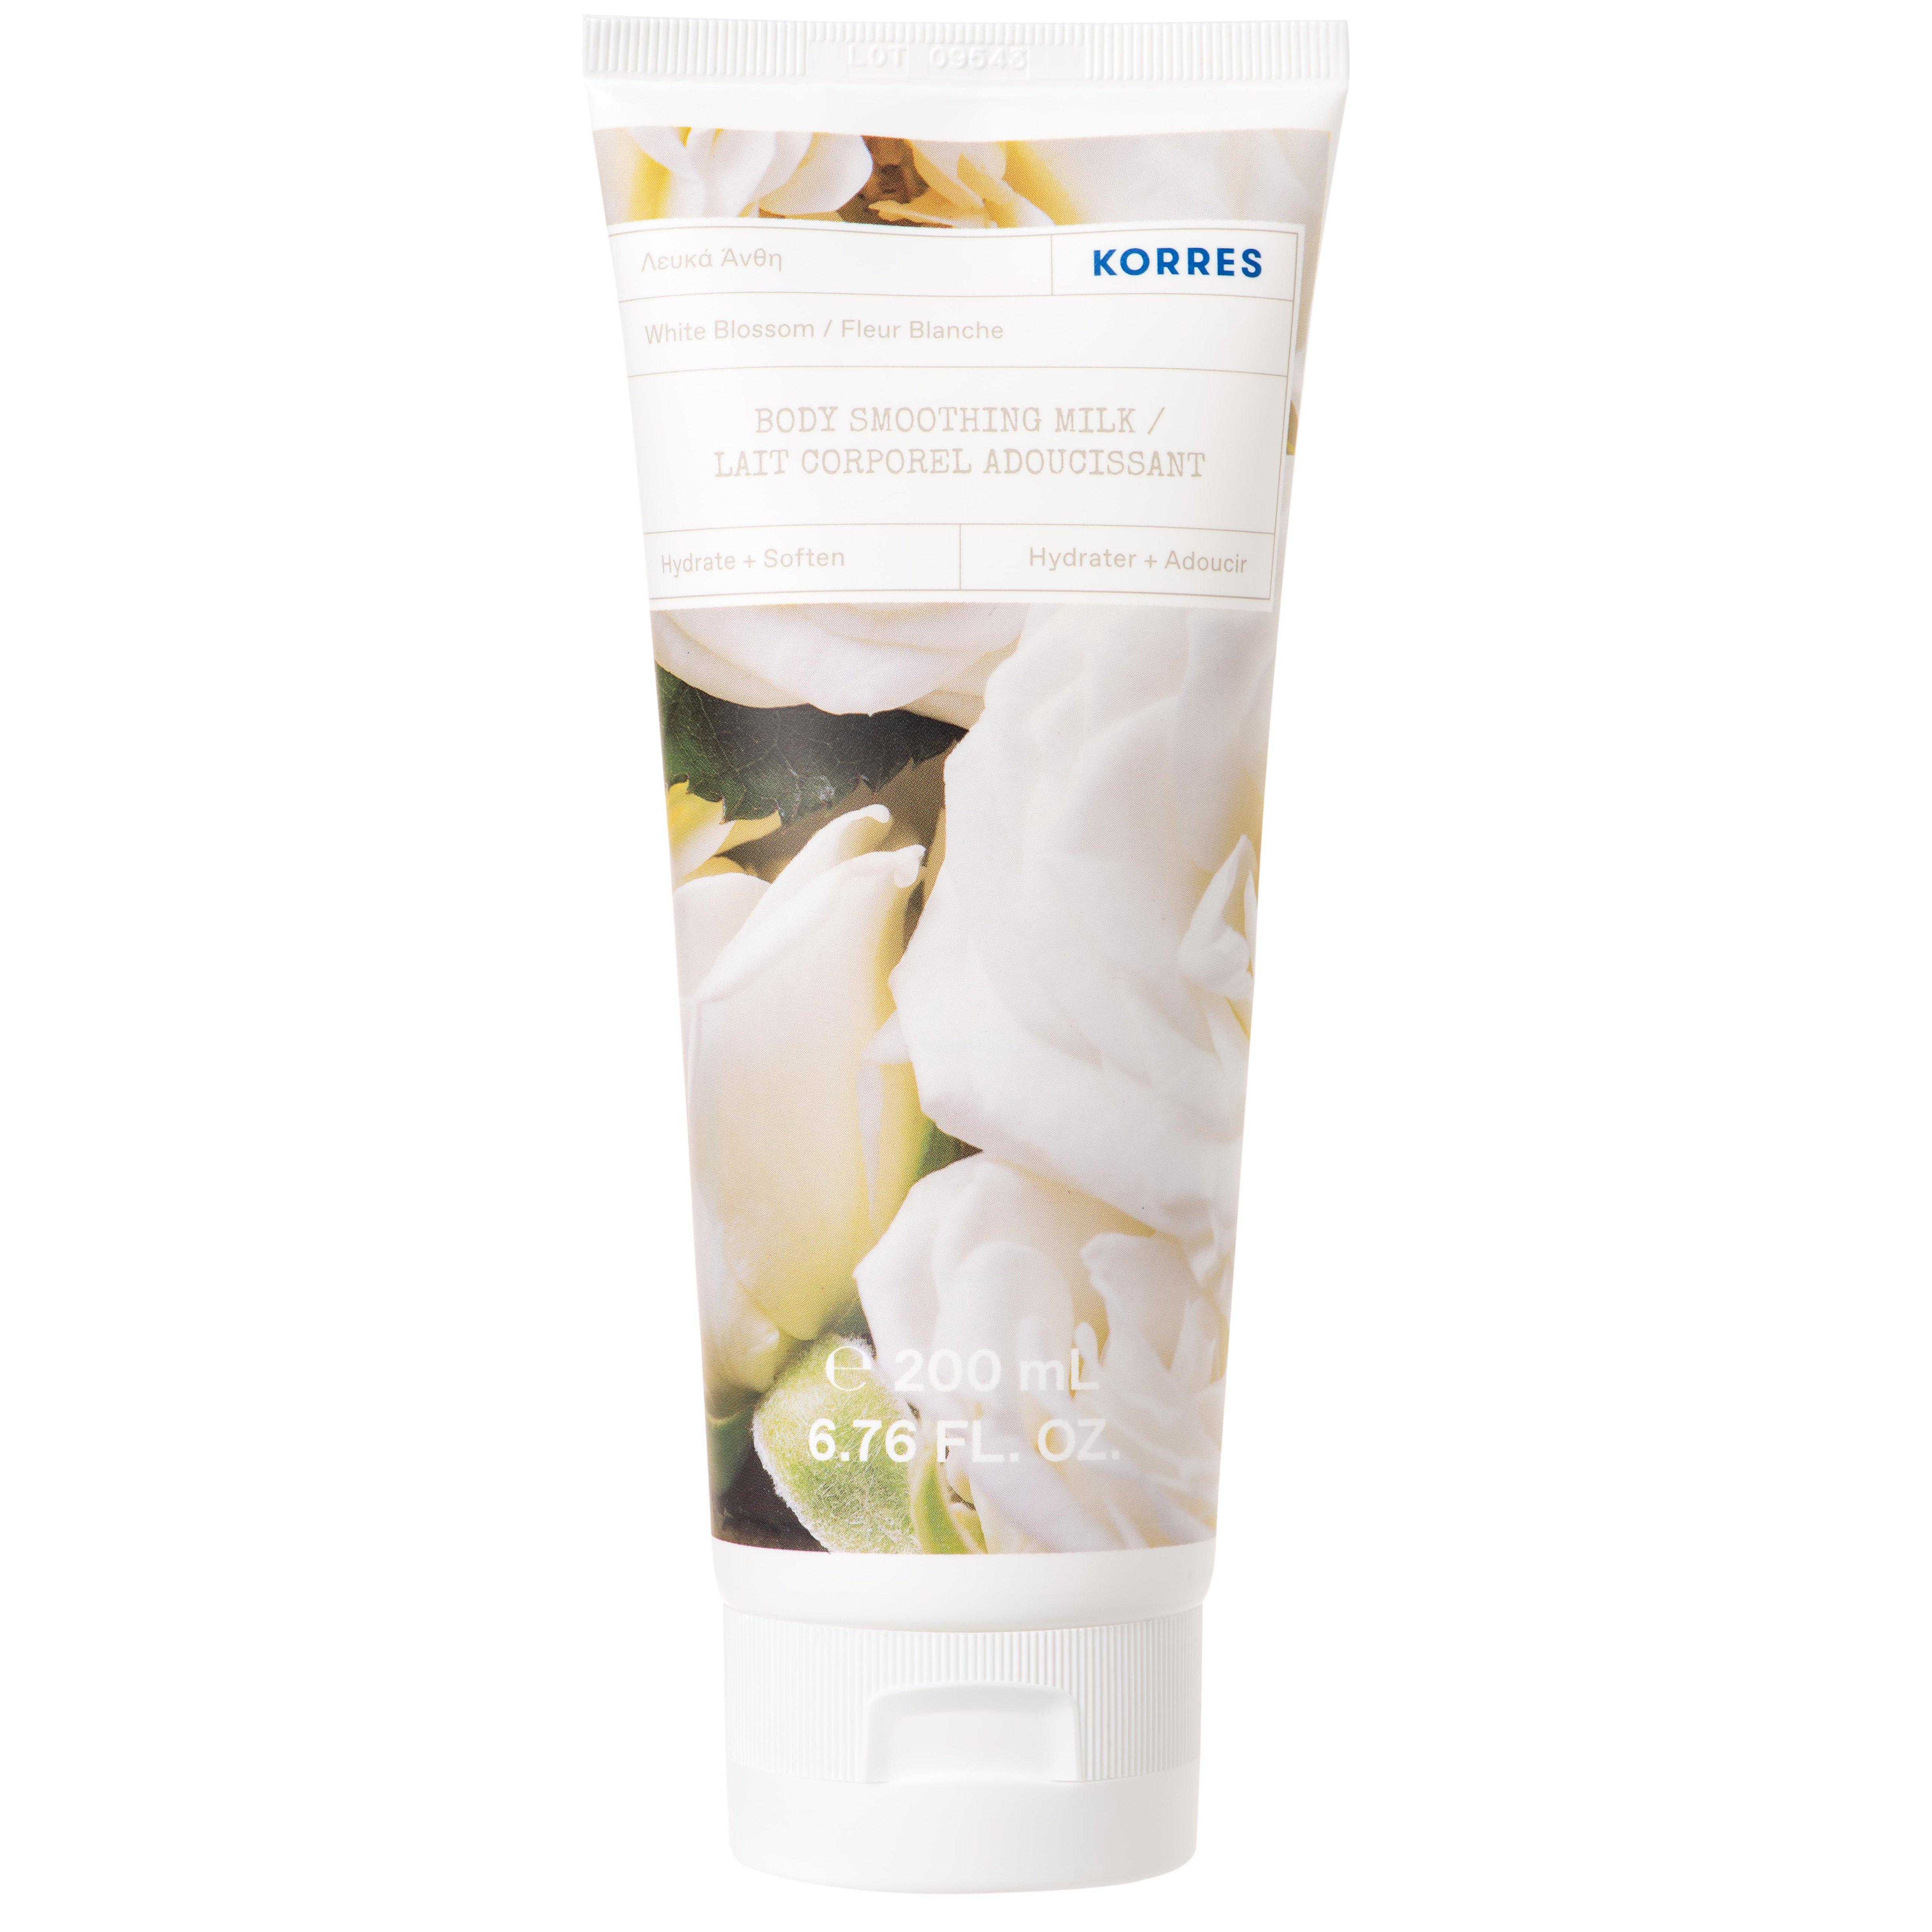 Korres White Blossom Body Smoothing Milk Ενυδατικό Γαλάκτωμα Σώματος Λευκά Άνθη 200ml